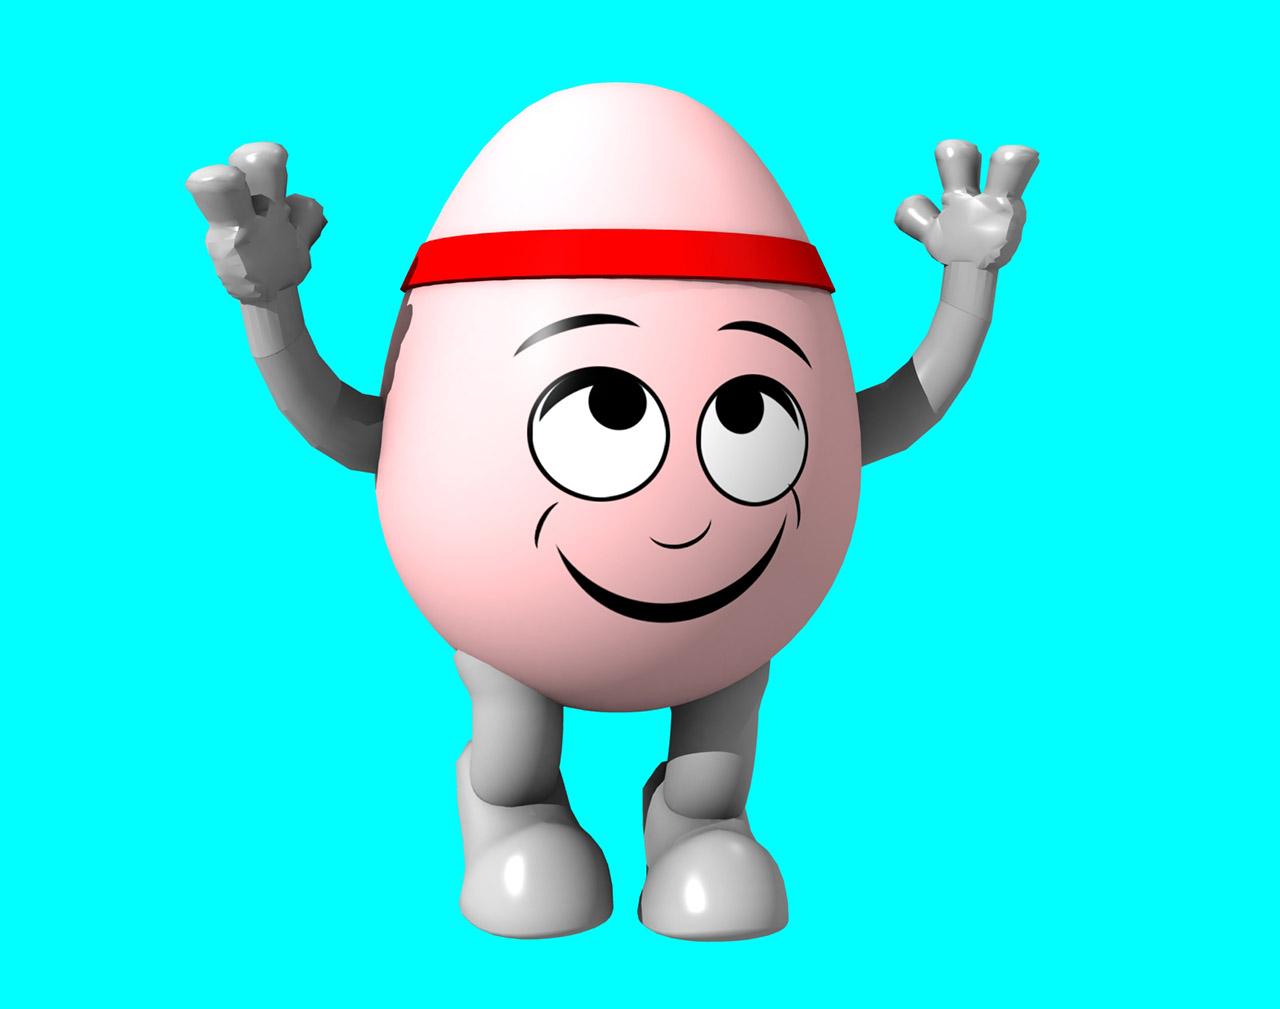 3D Egg Character Generation